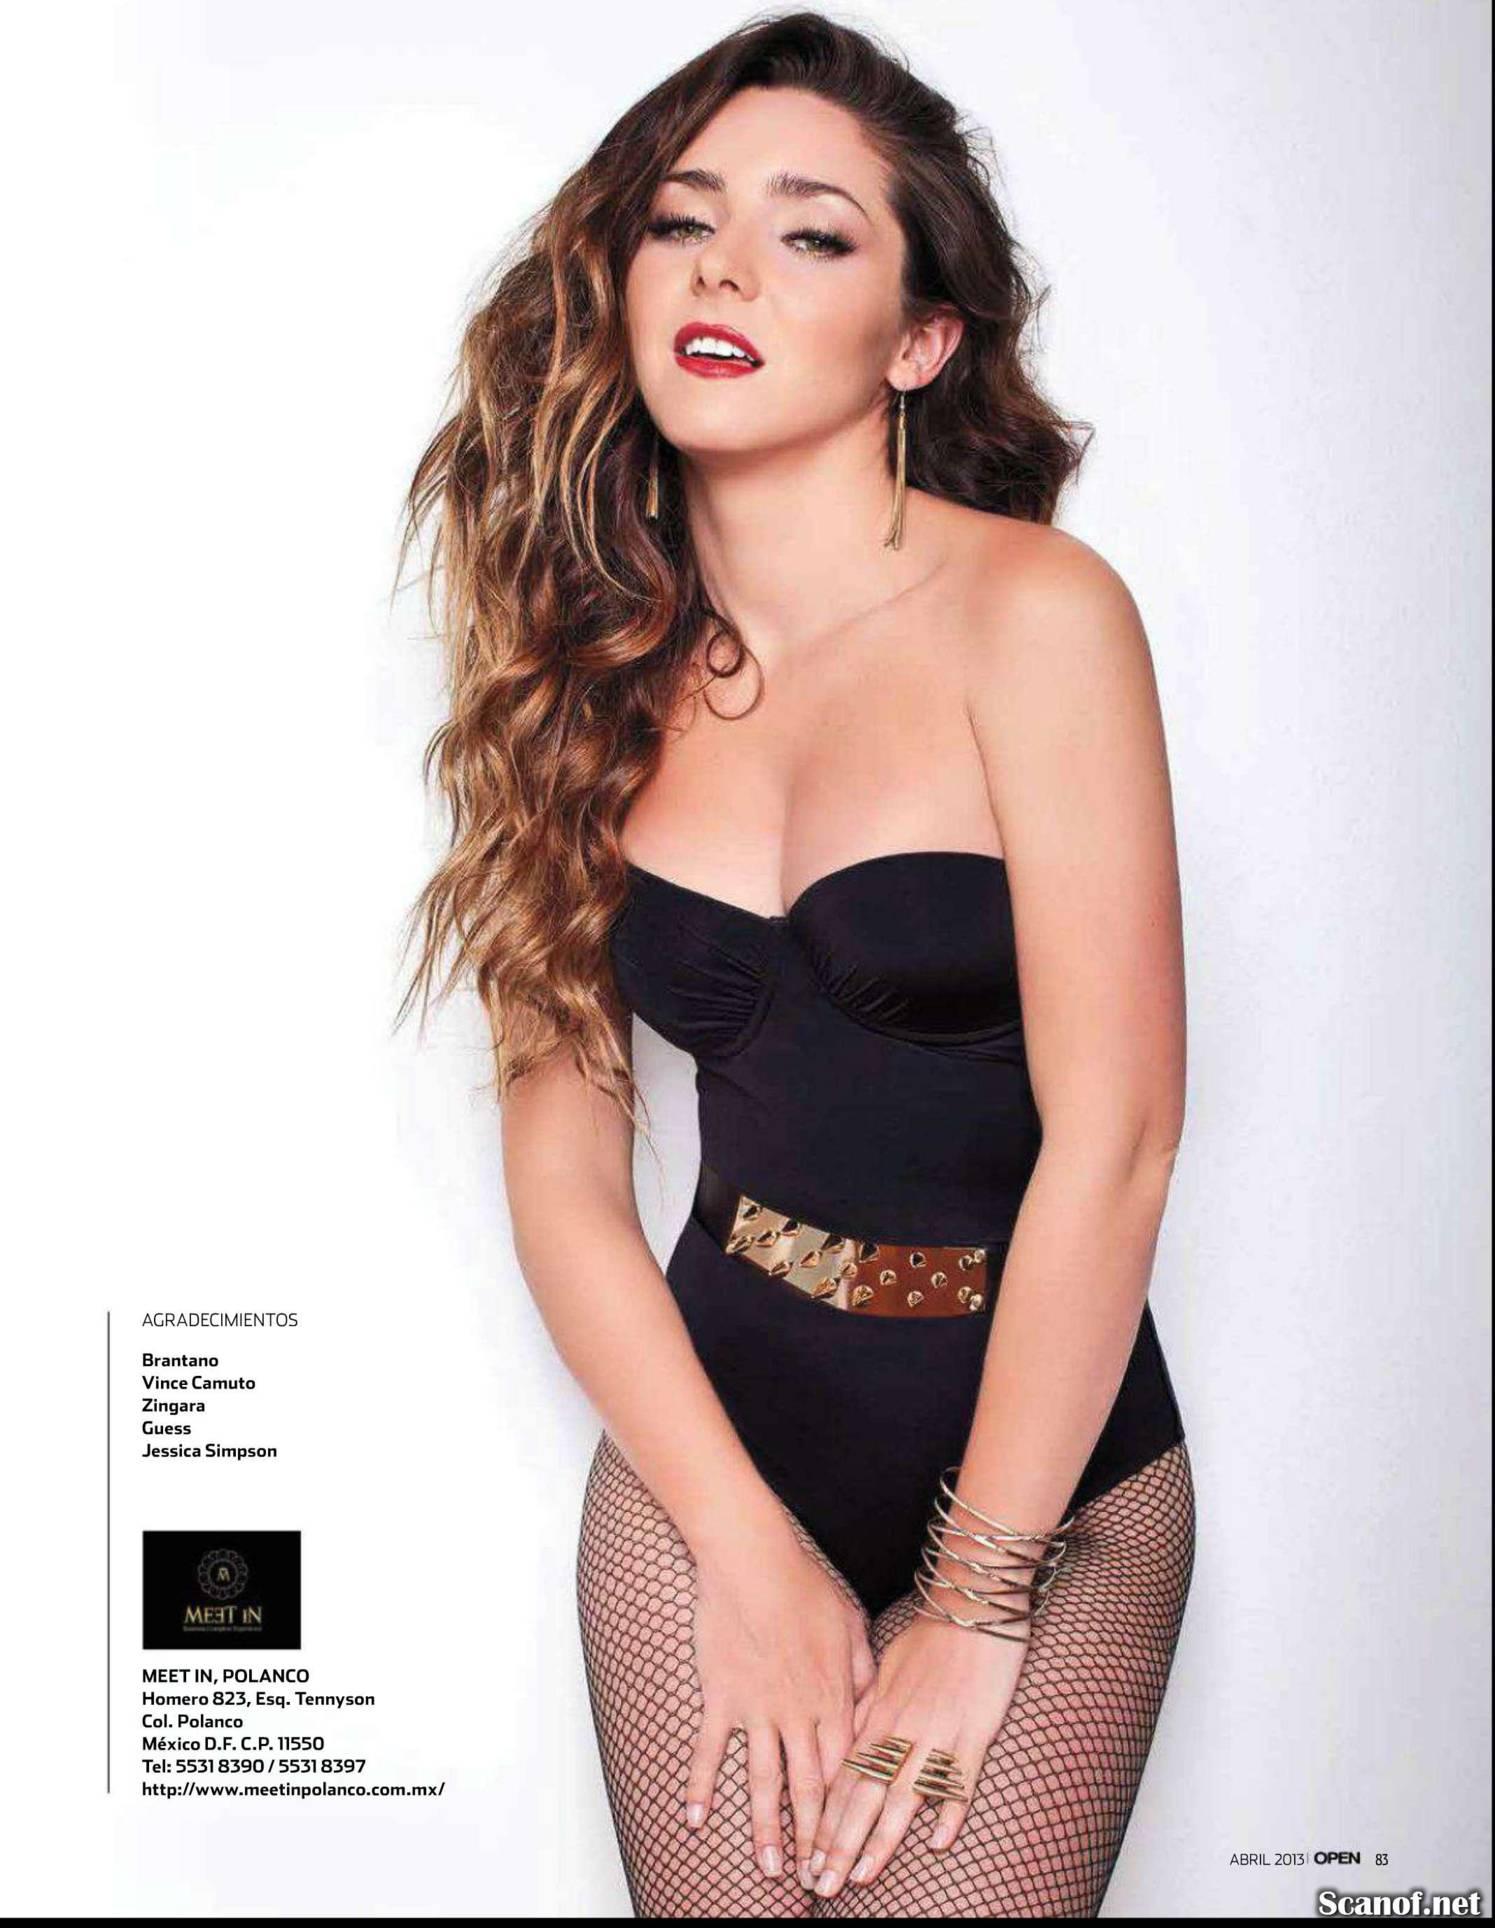 Ariadne Diaz Pics ariadne diaz - open mx magazine -12 | gotceleb